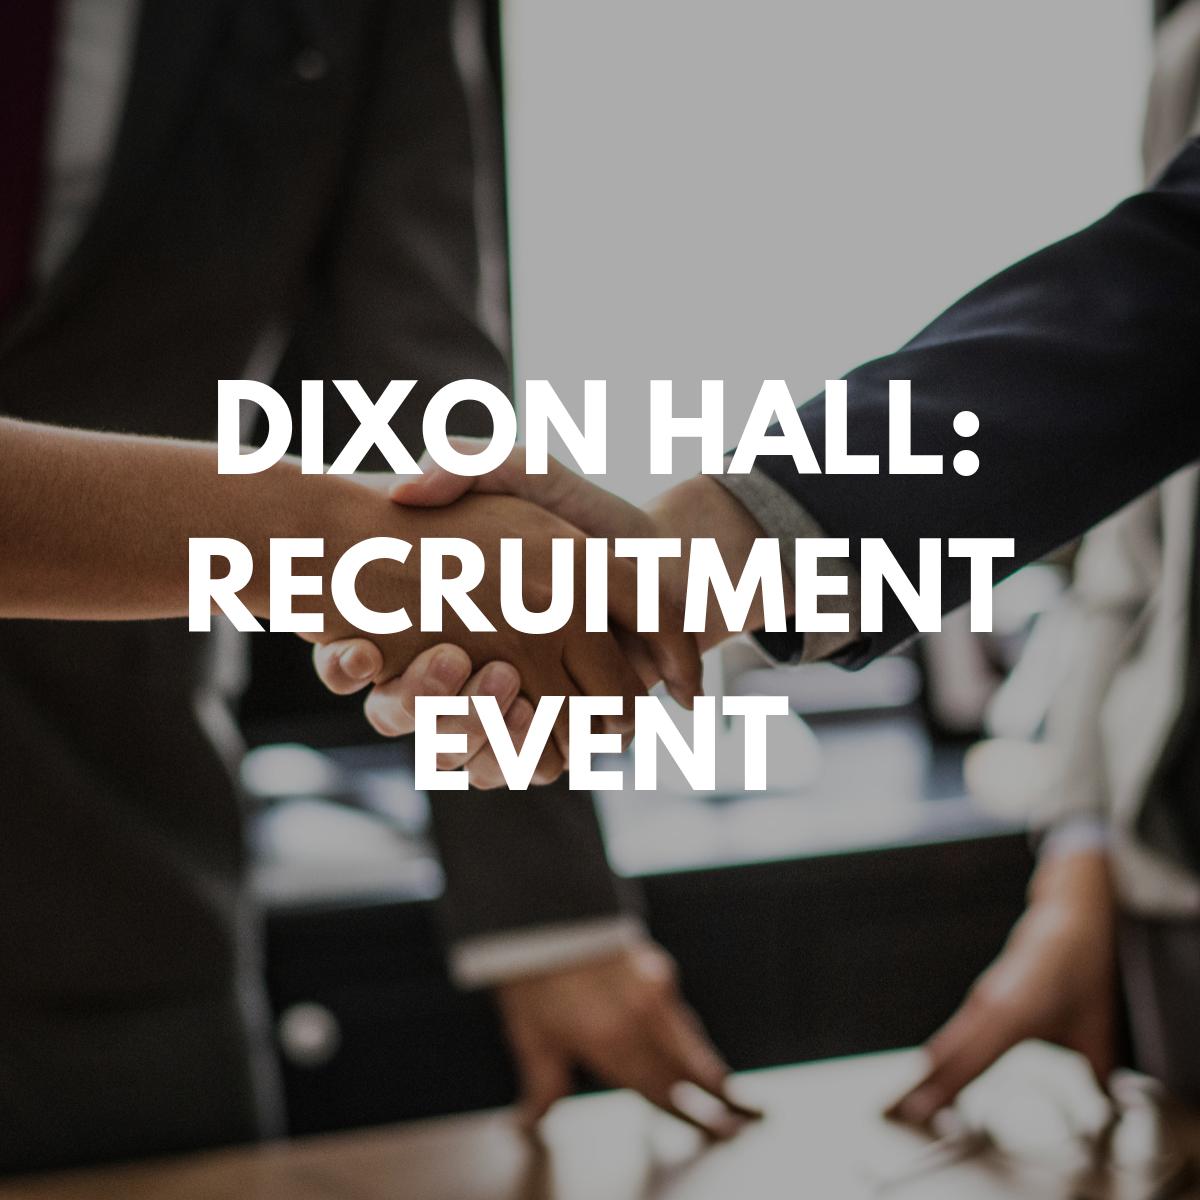 Dixon Hall: Recruitment Event